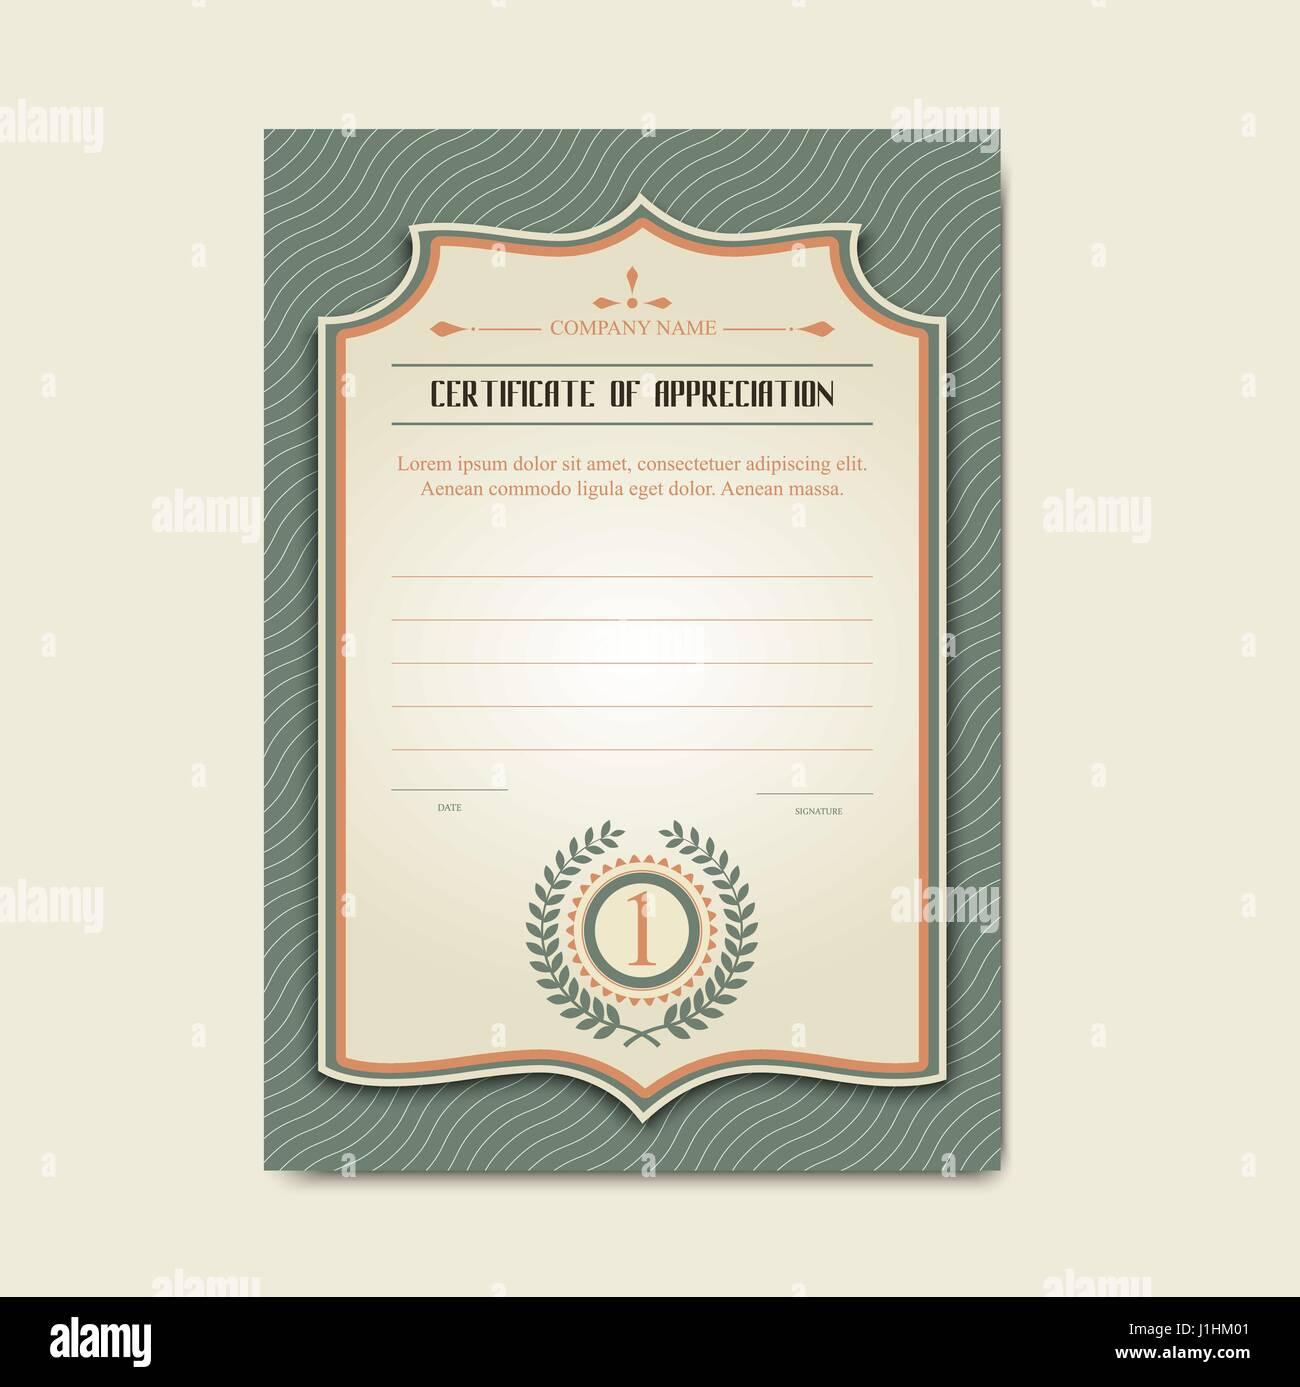 Company Stock Certificate Stockfotos & Company Stock Certificate ...